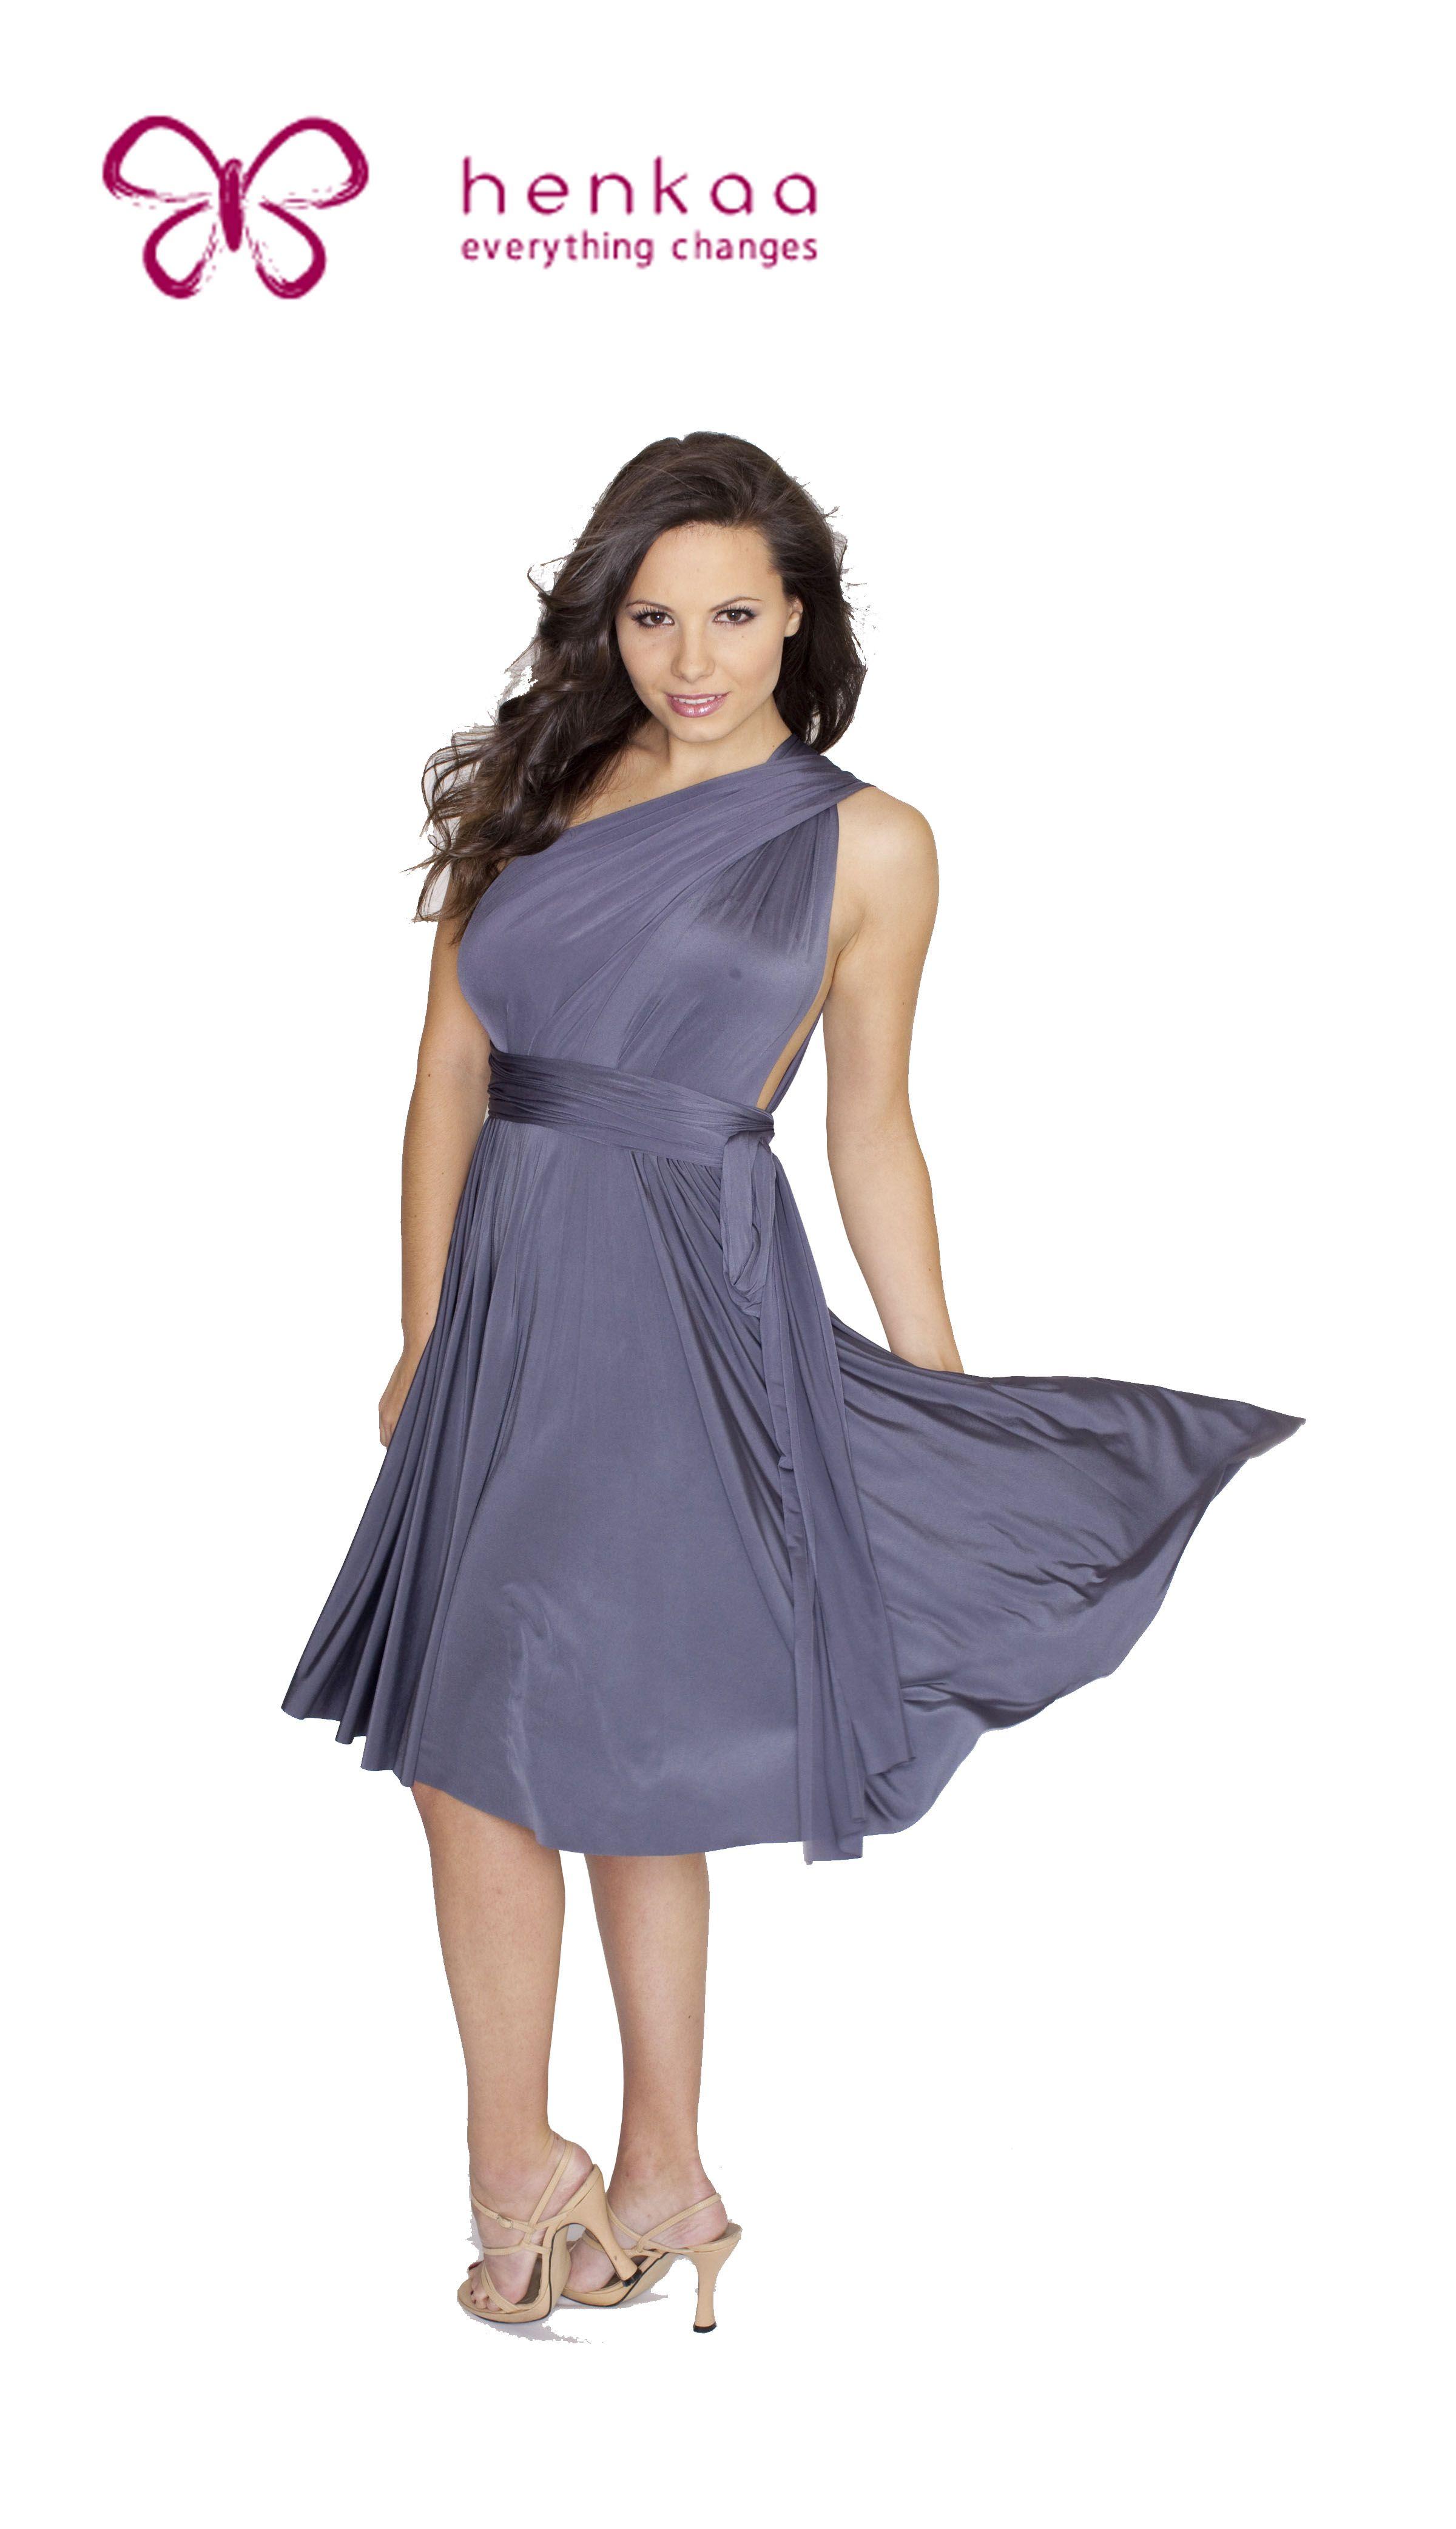 8dc789fefb2 Henkaa Sakura Convertible Short Dress  128.00 www.henkaa.com